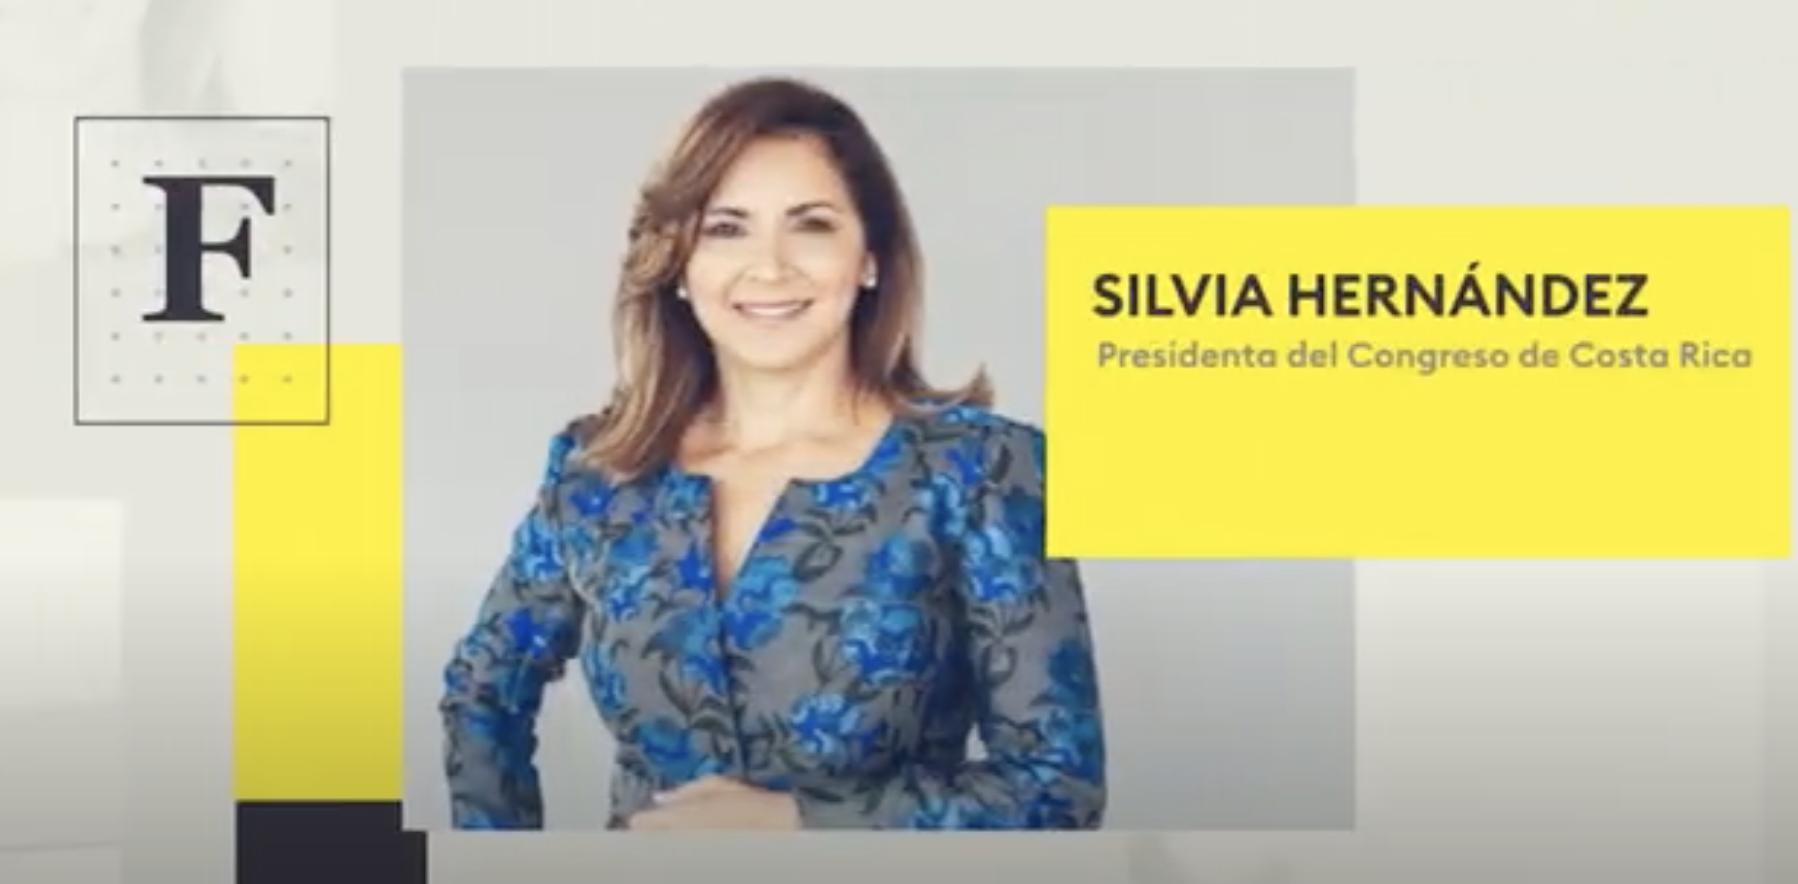 Mujeres Poderosas: Silvia Hernández